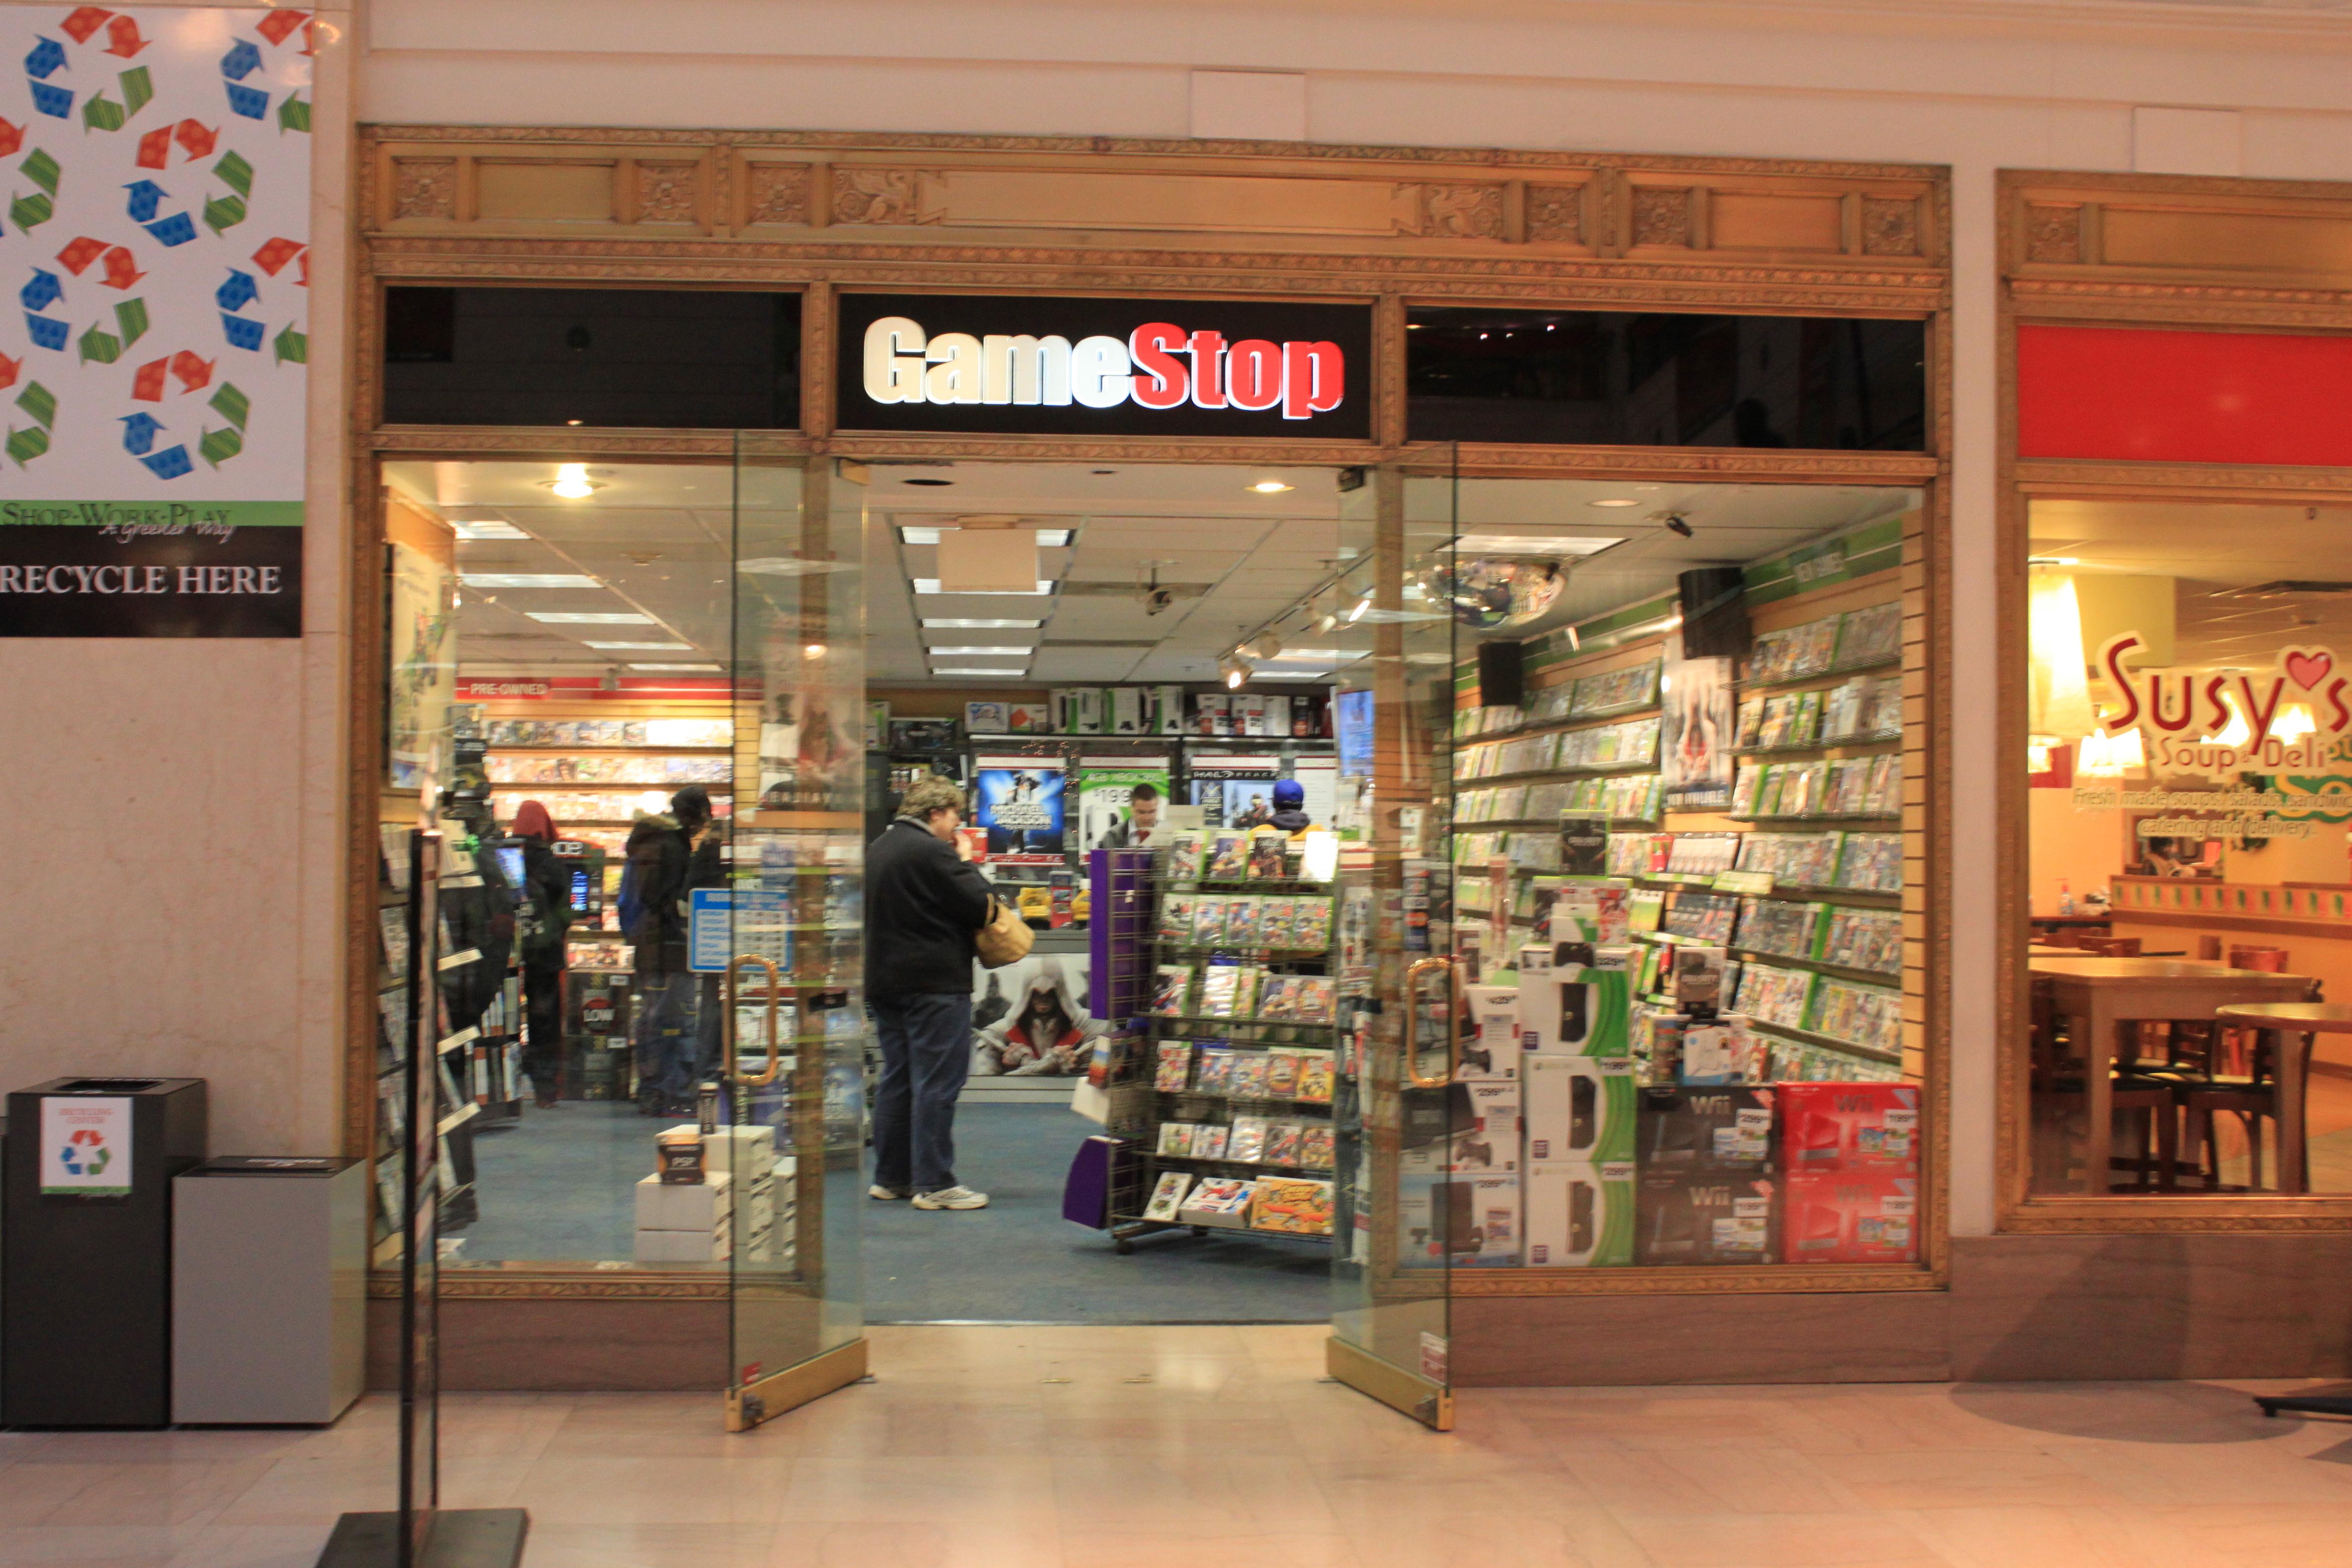 Market slams GameStop after retailer misses Q3 earnings ...